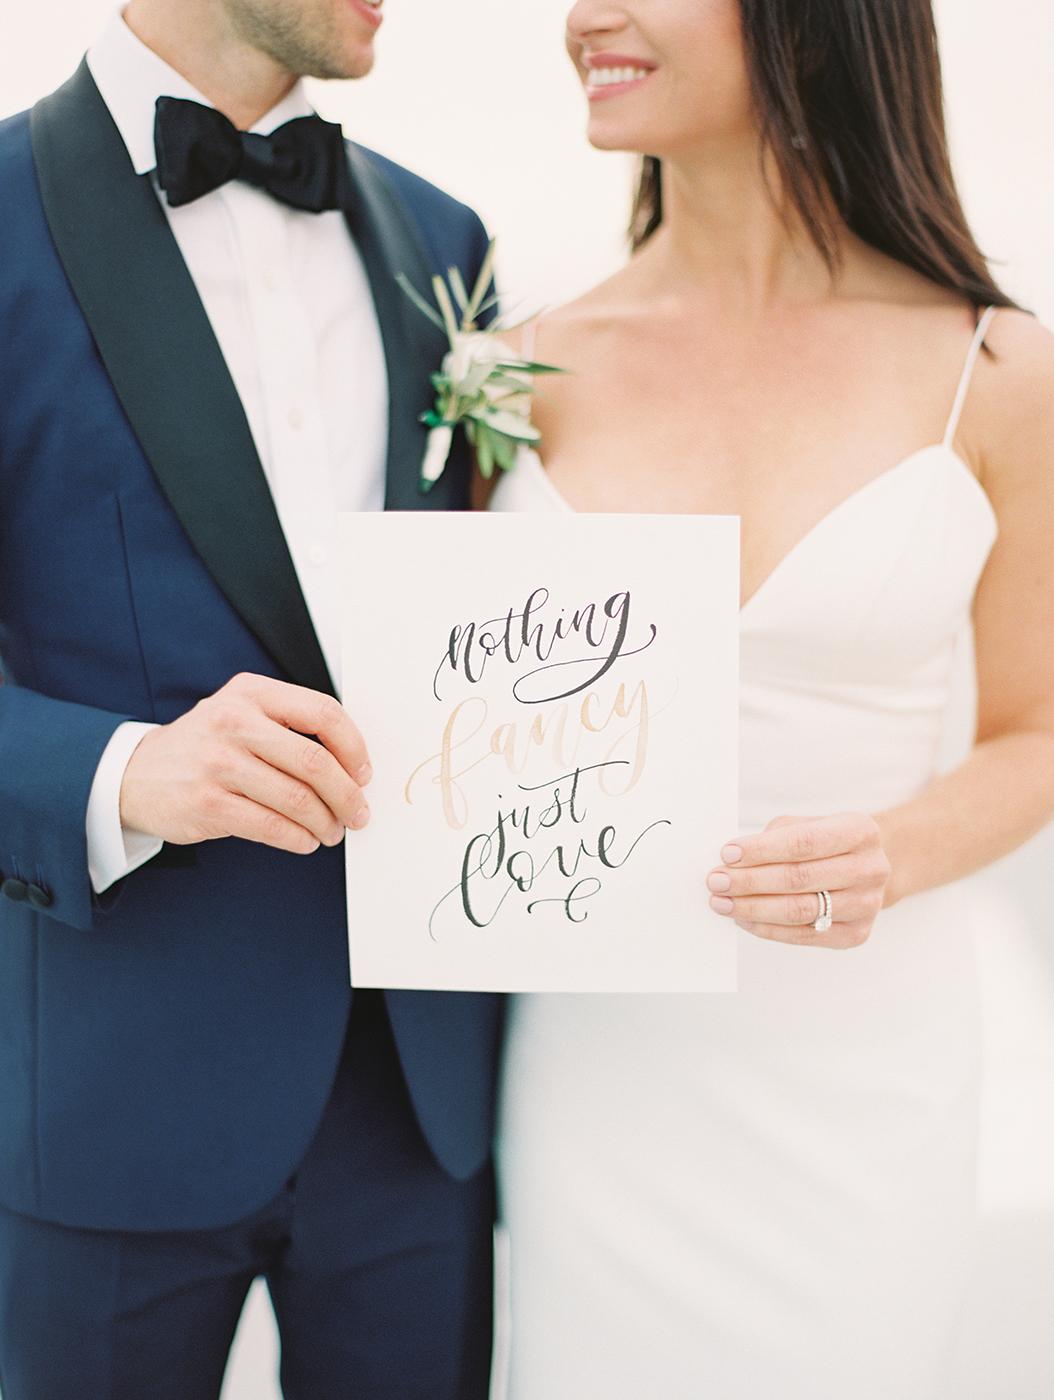 Sam Allen Creates – Wedding Nothing Fancy Just Love Sign – Santorini Greece Wedding